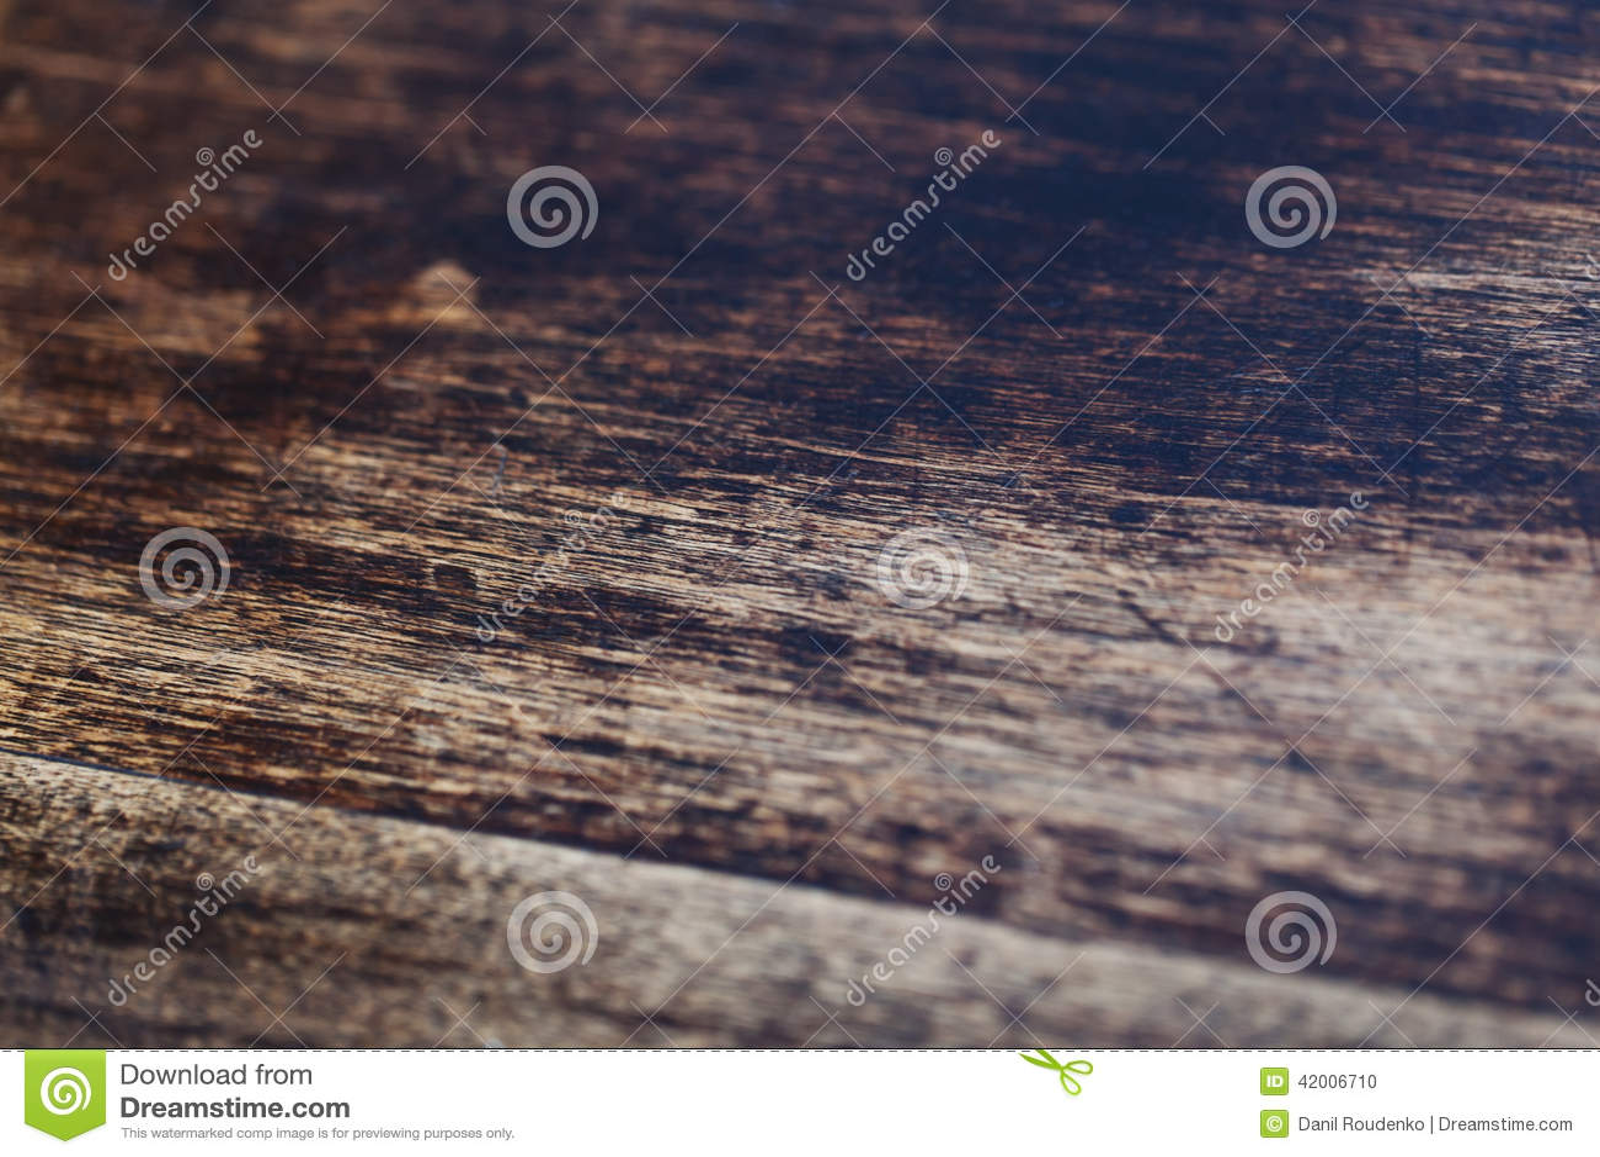 Worn out wooden floor stock photo image 42006710 Worn wood floors